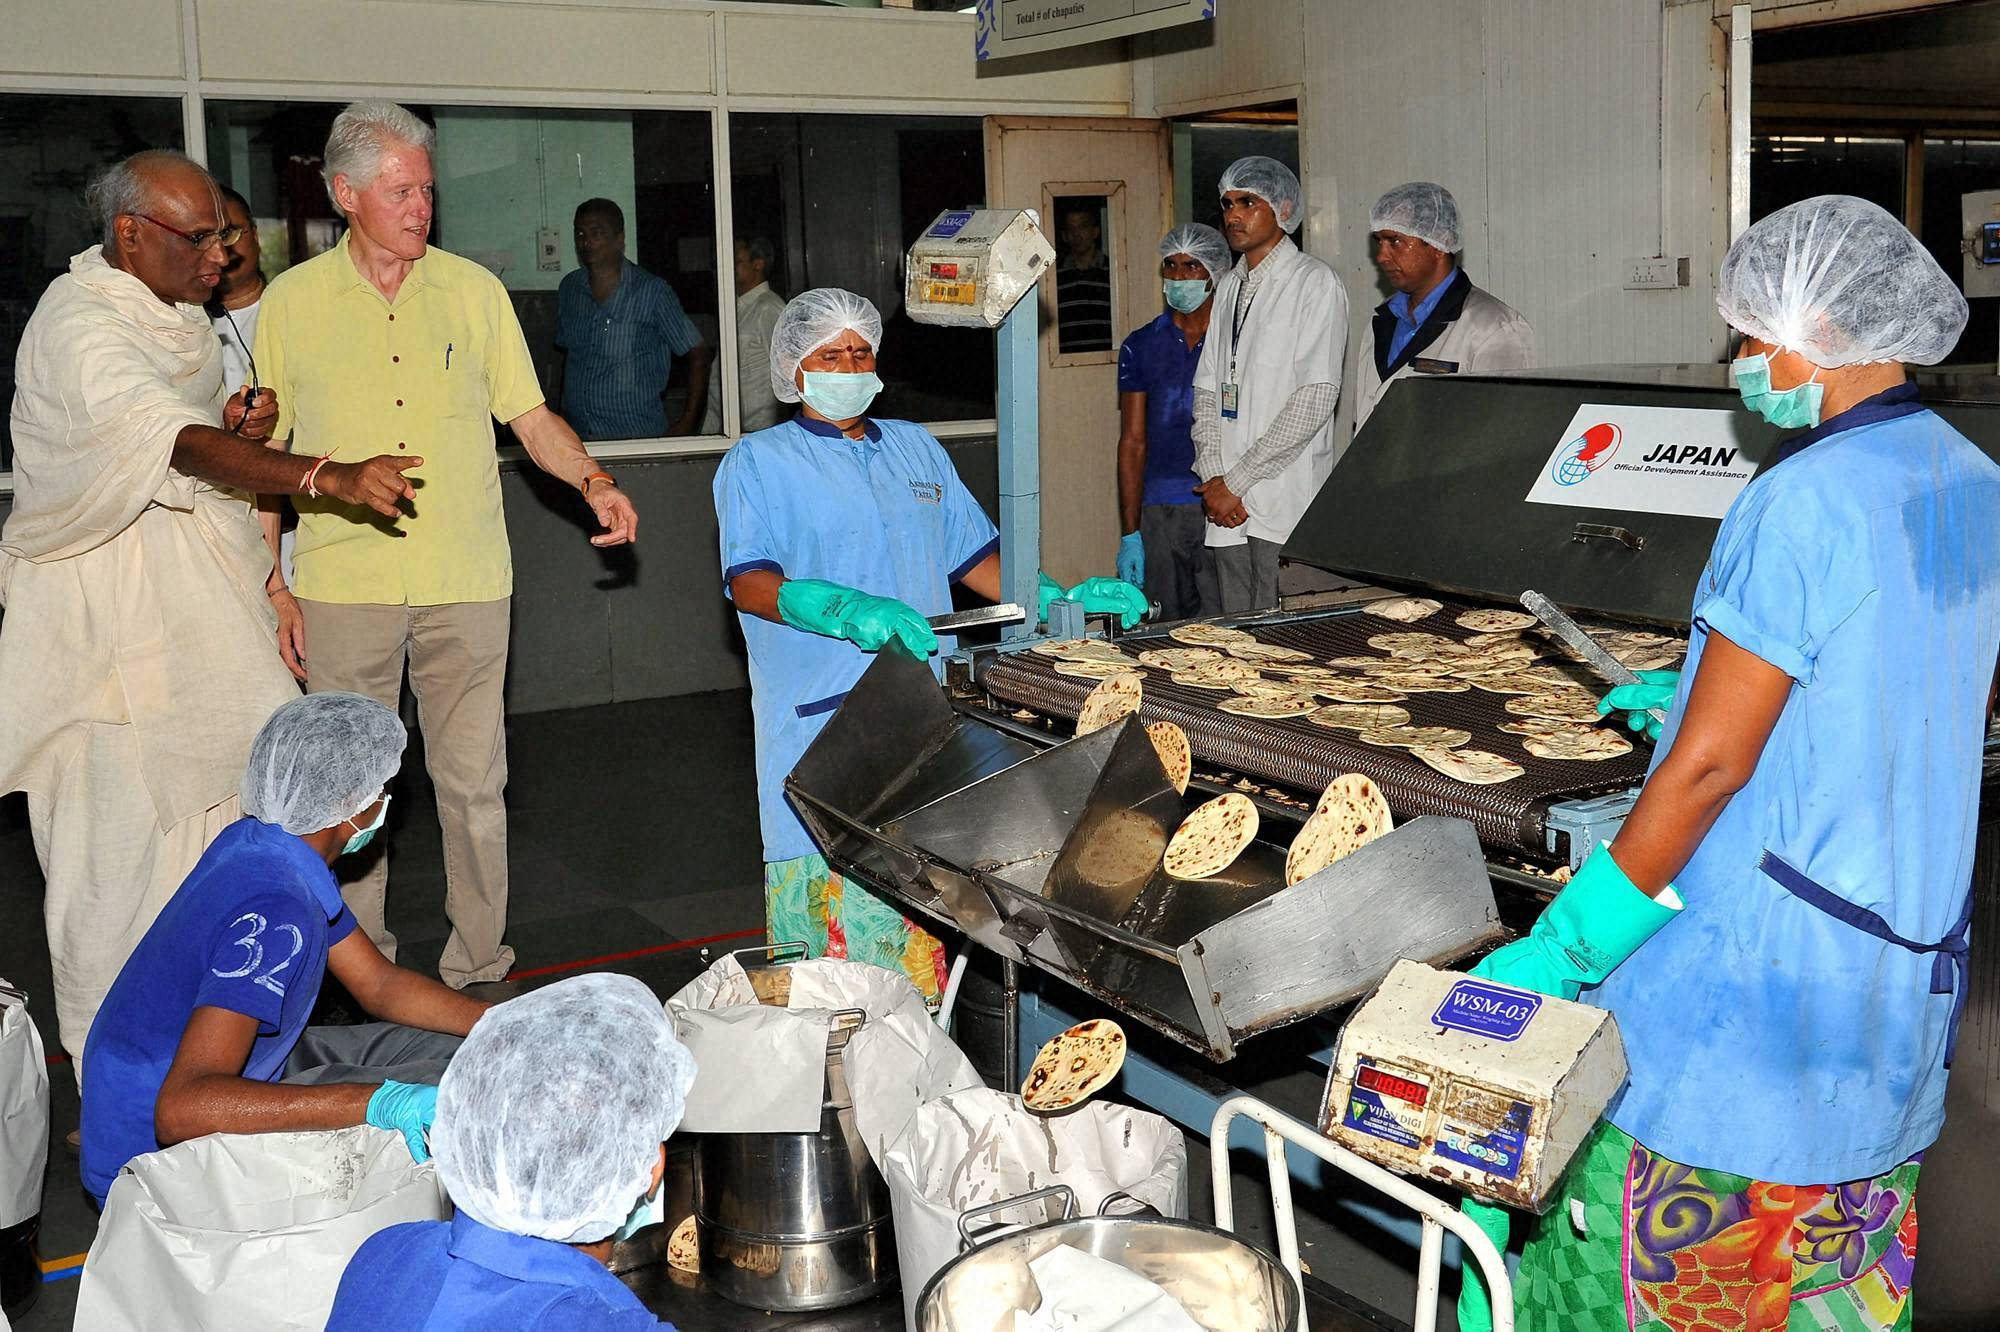 Former US President, Bill Clinton, Akshaya Patra, kitchen, Jaipur